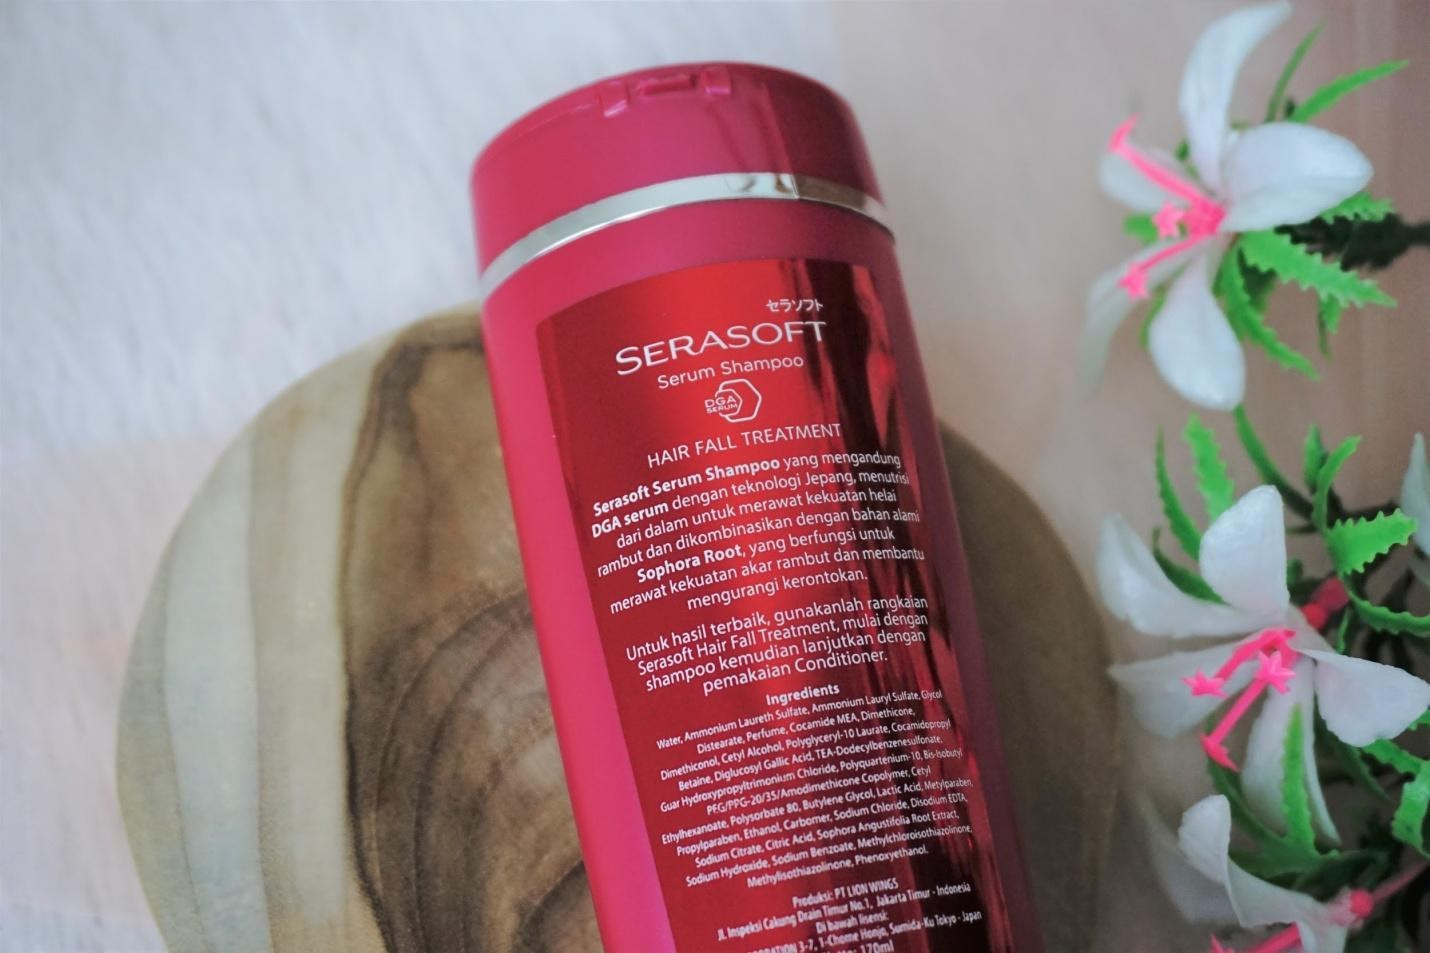 Rambut Jadi Nurut dengan Serasoft Serum Shampoo & Conditioner